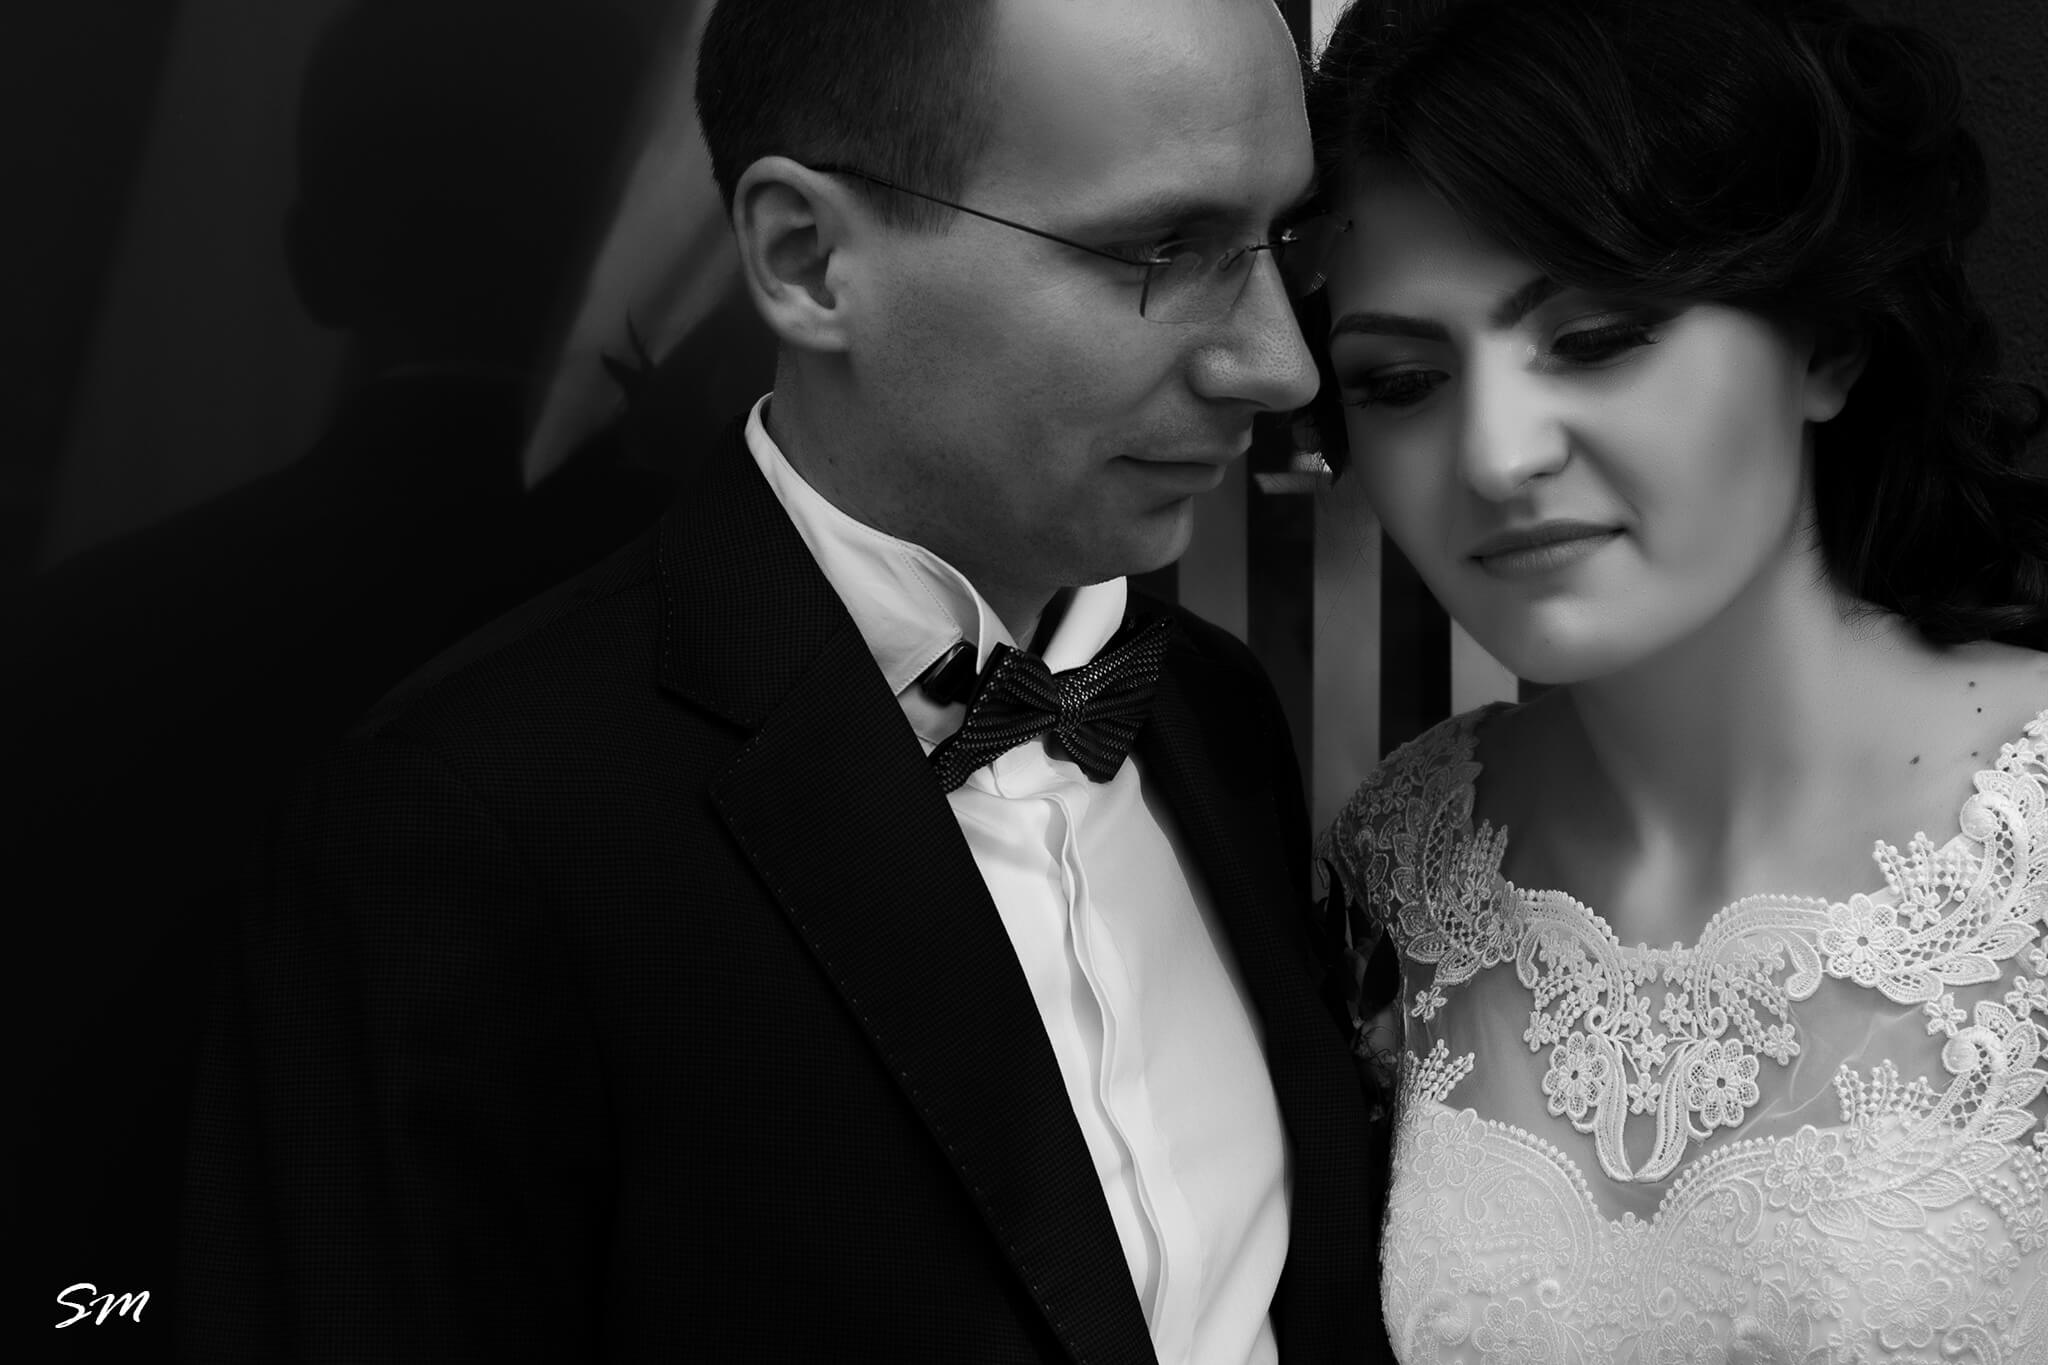 fotograf_nunta_profesionist_suceava (18)